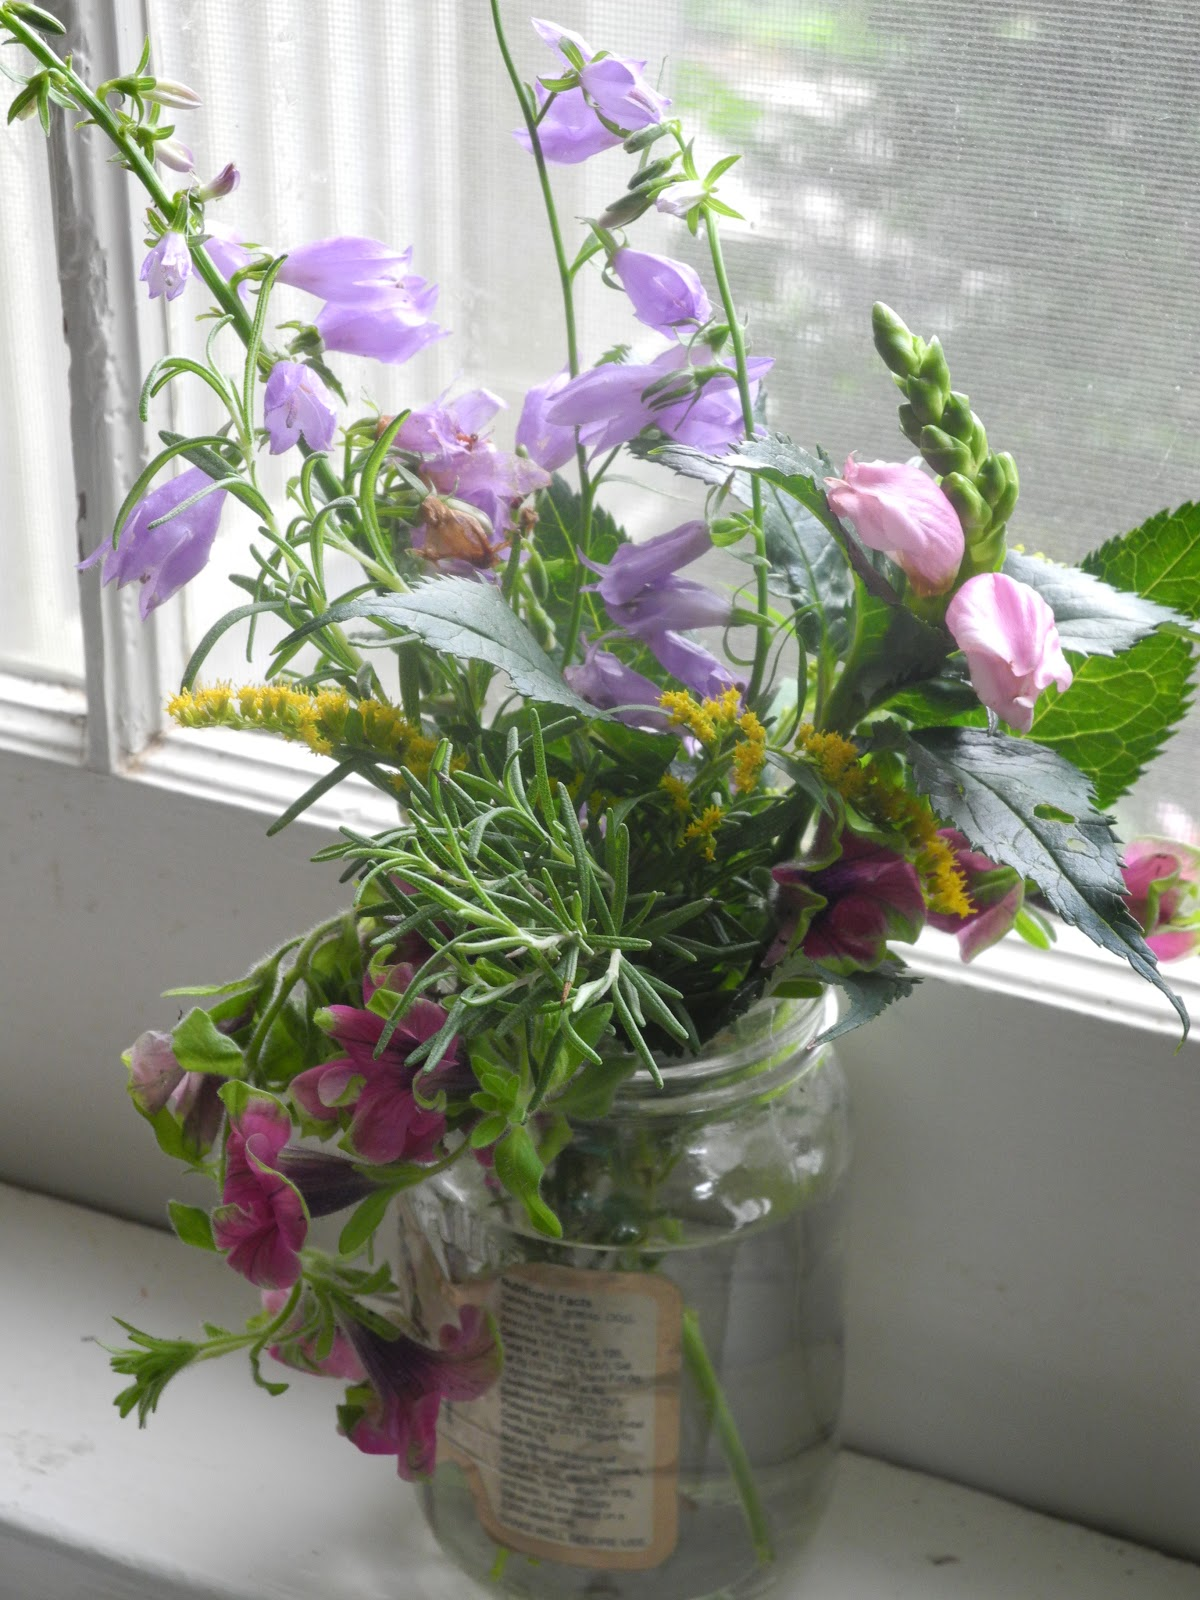 church wedding flower arrangement - Google Search   wedding ...